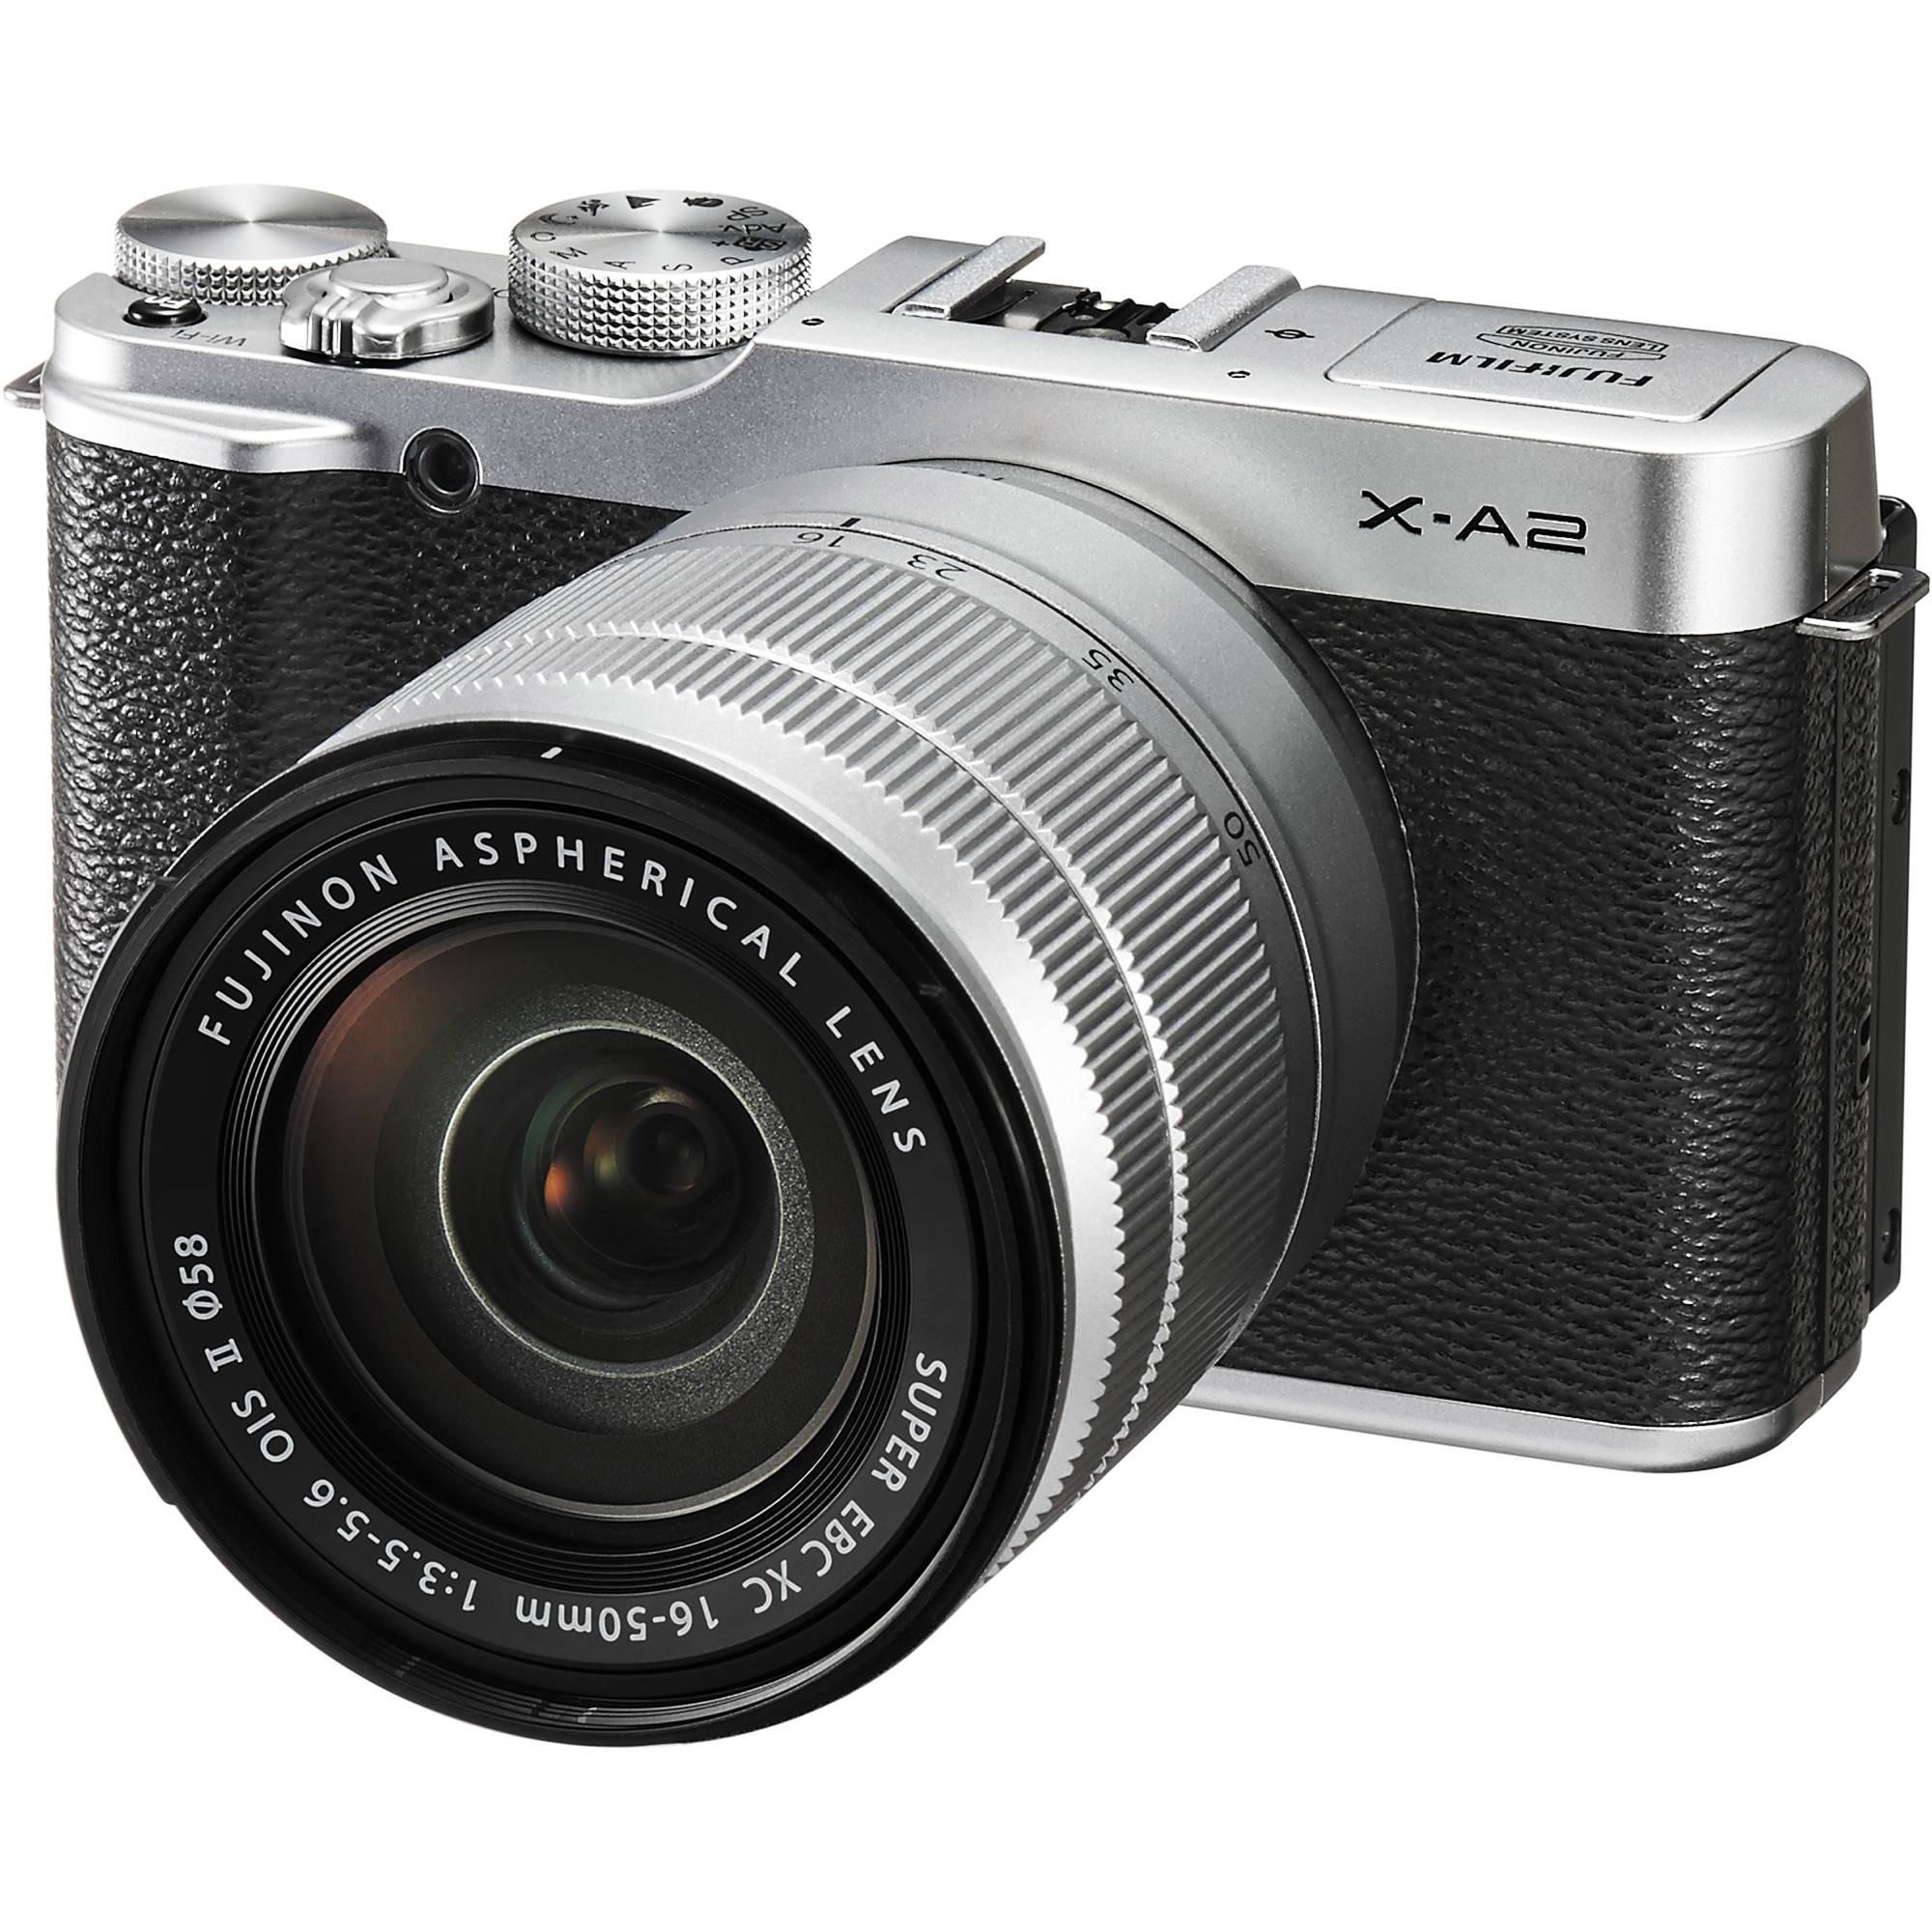 Fujifilm X A2 Mirrorless Digital Camera With 16 50mm Lens Silver